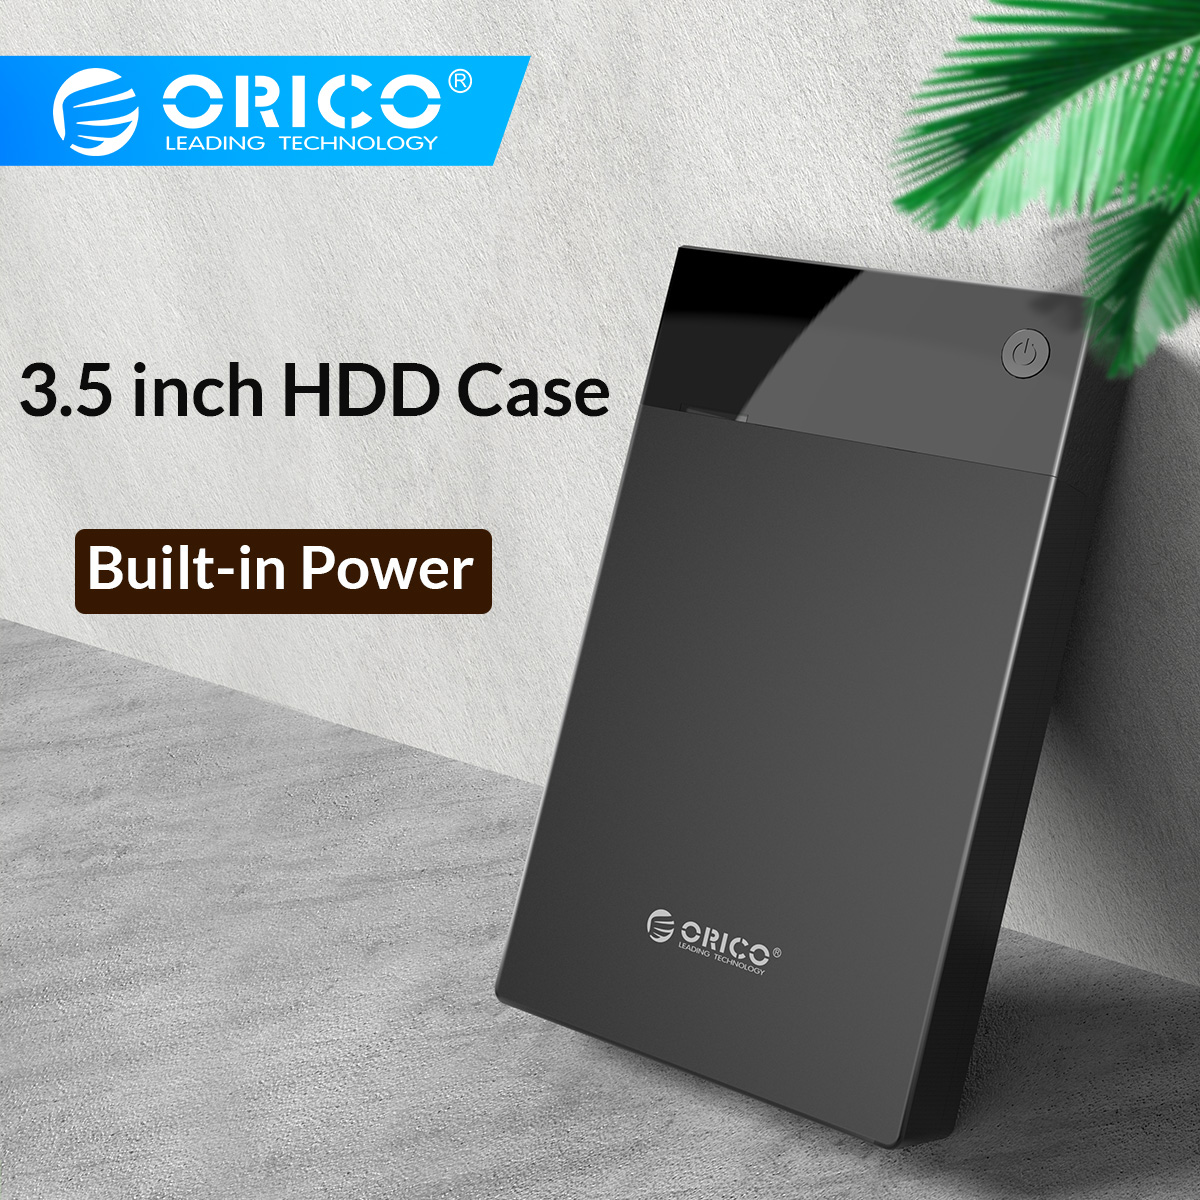 ORICO 3.5Inch HDD Case Bulit-in Power 12V Portable SATA toUSB 3.0 Hard Enclosure